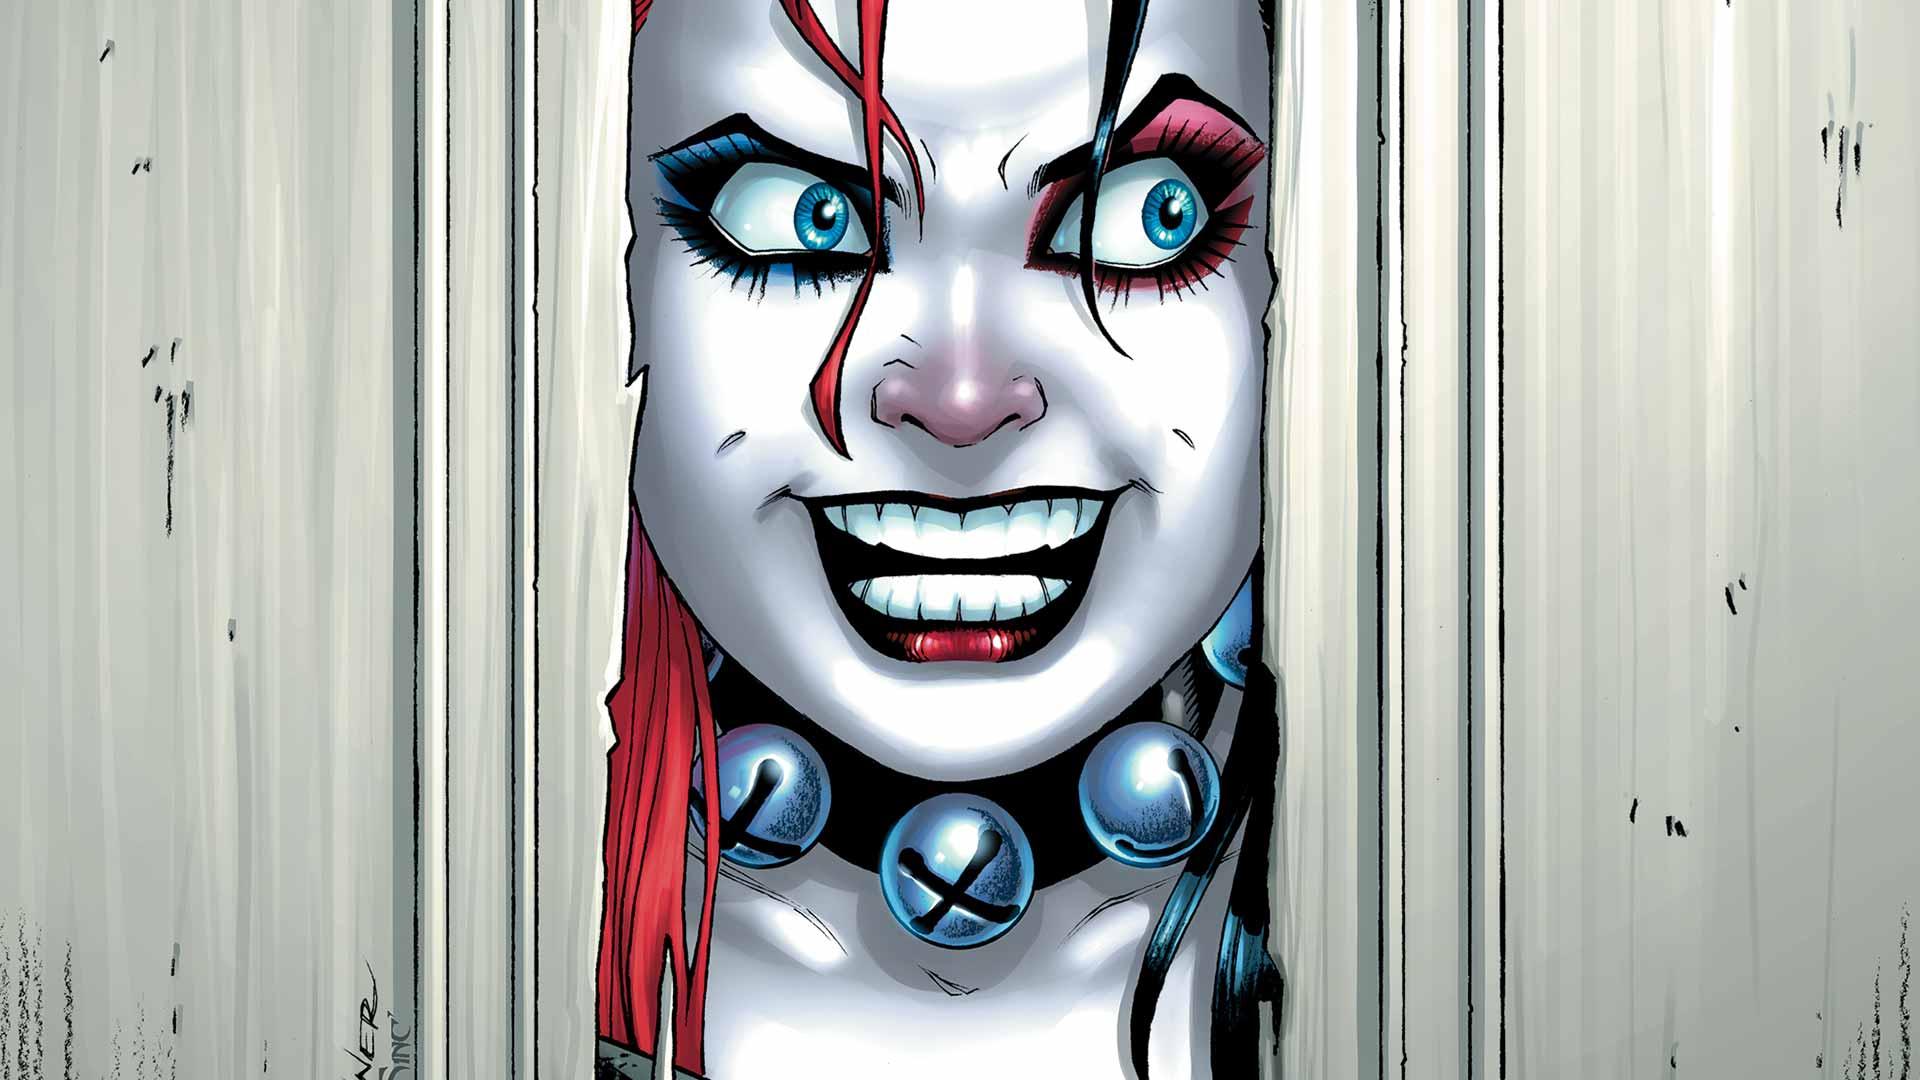 Good Wallpaper Movie Harley Quinn - harley-solo  Pic_187870.jpg